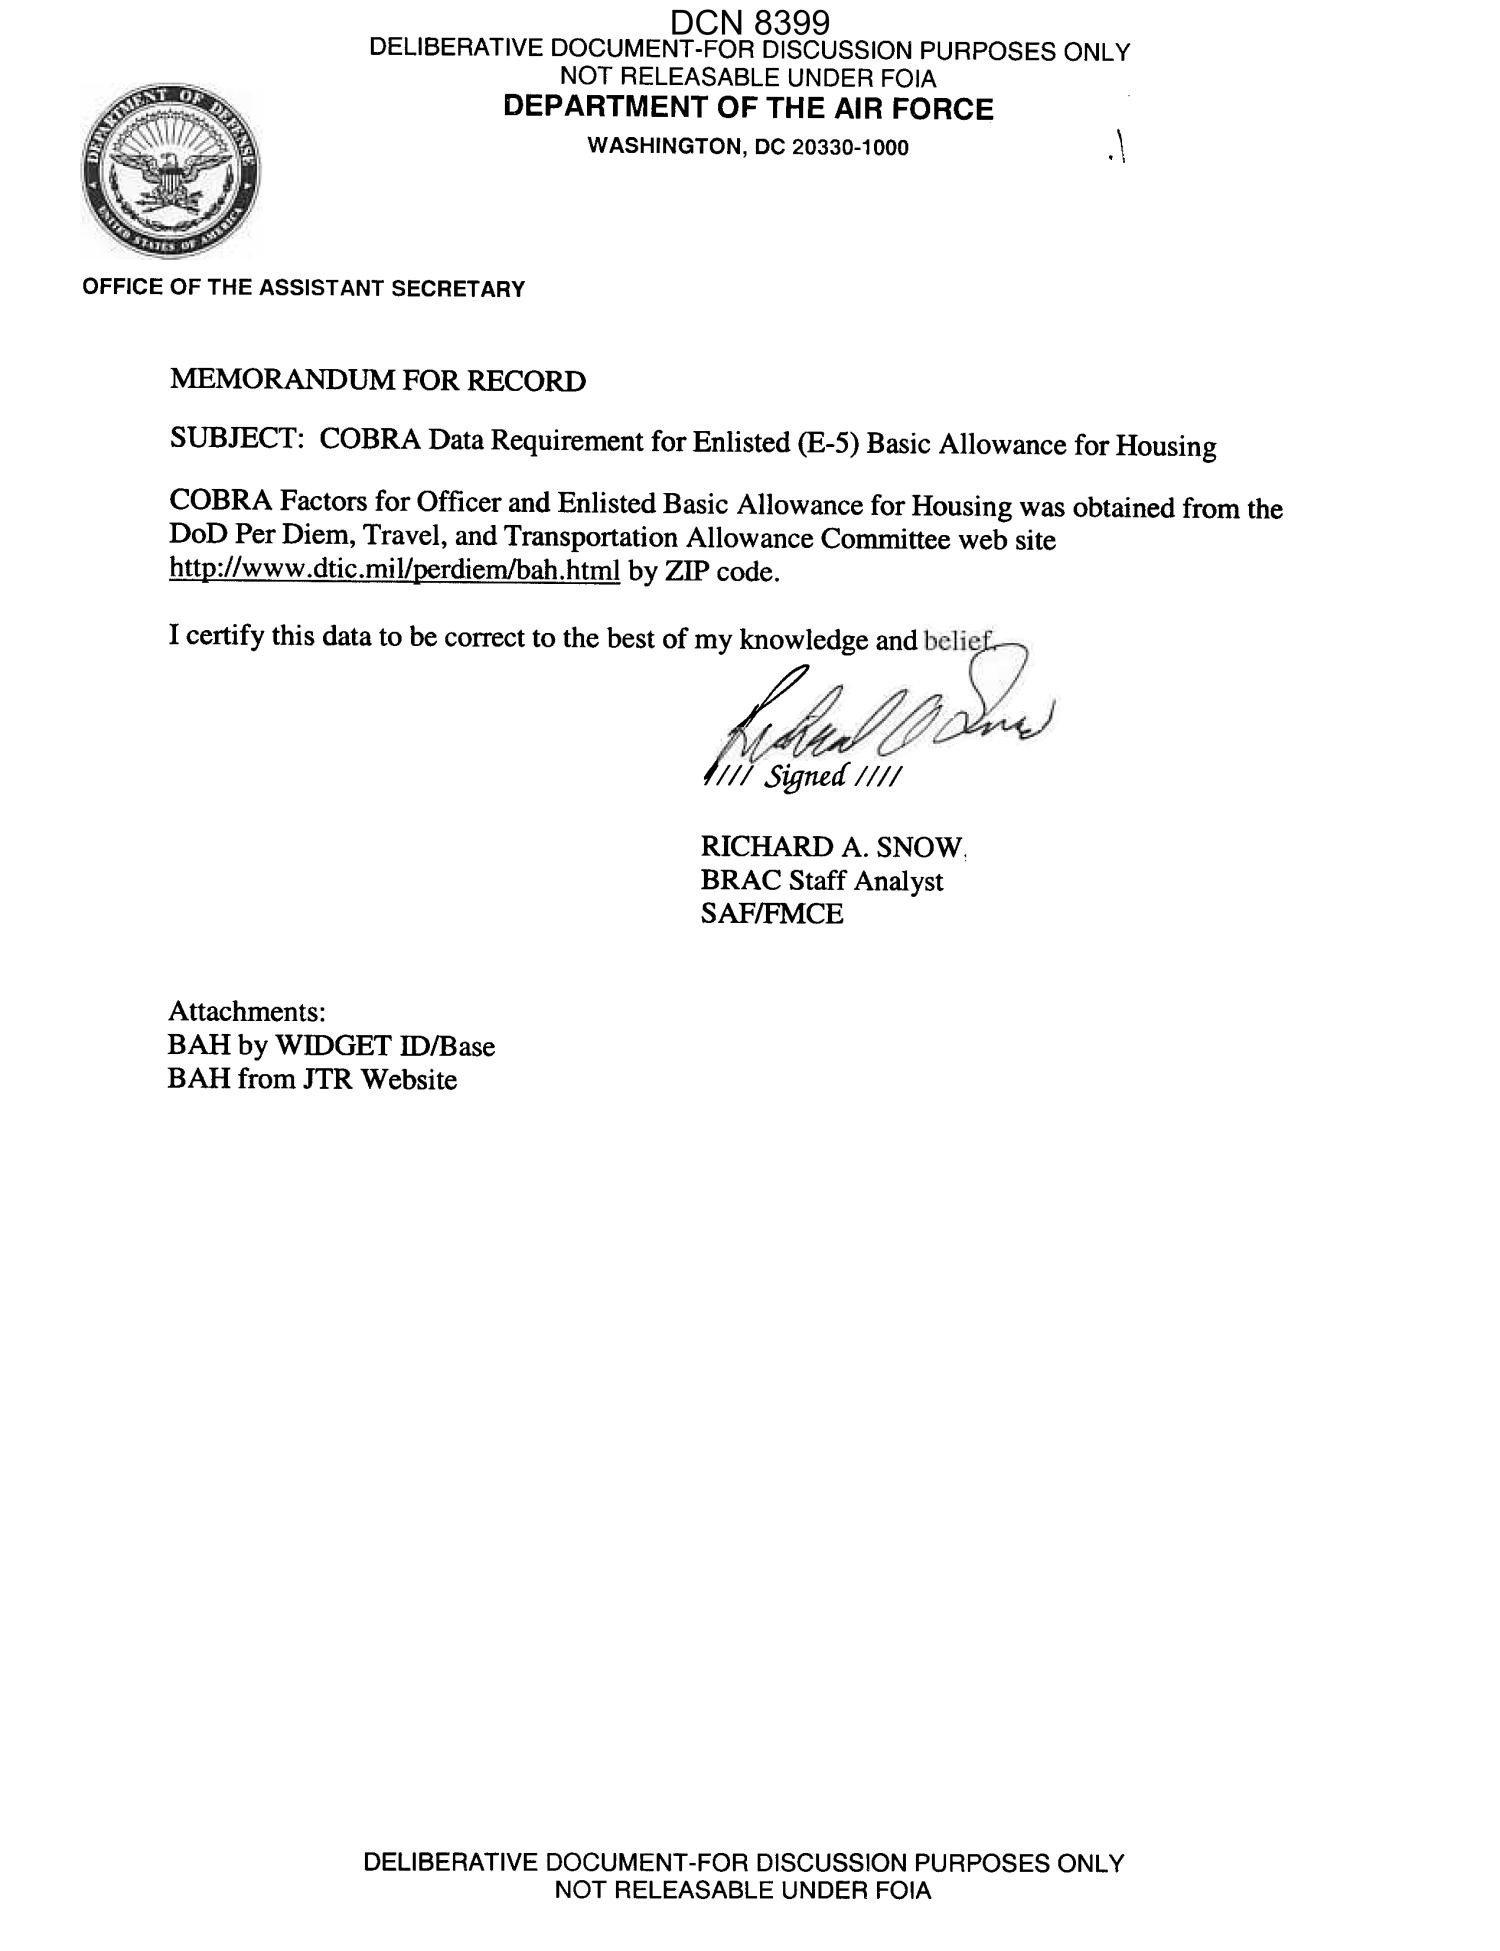 Memorandum for Record Army Memorandum for Record From Richard A Snow Brac Staff